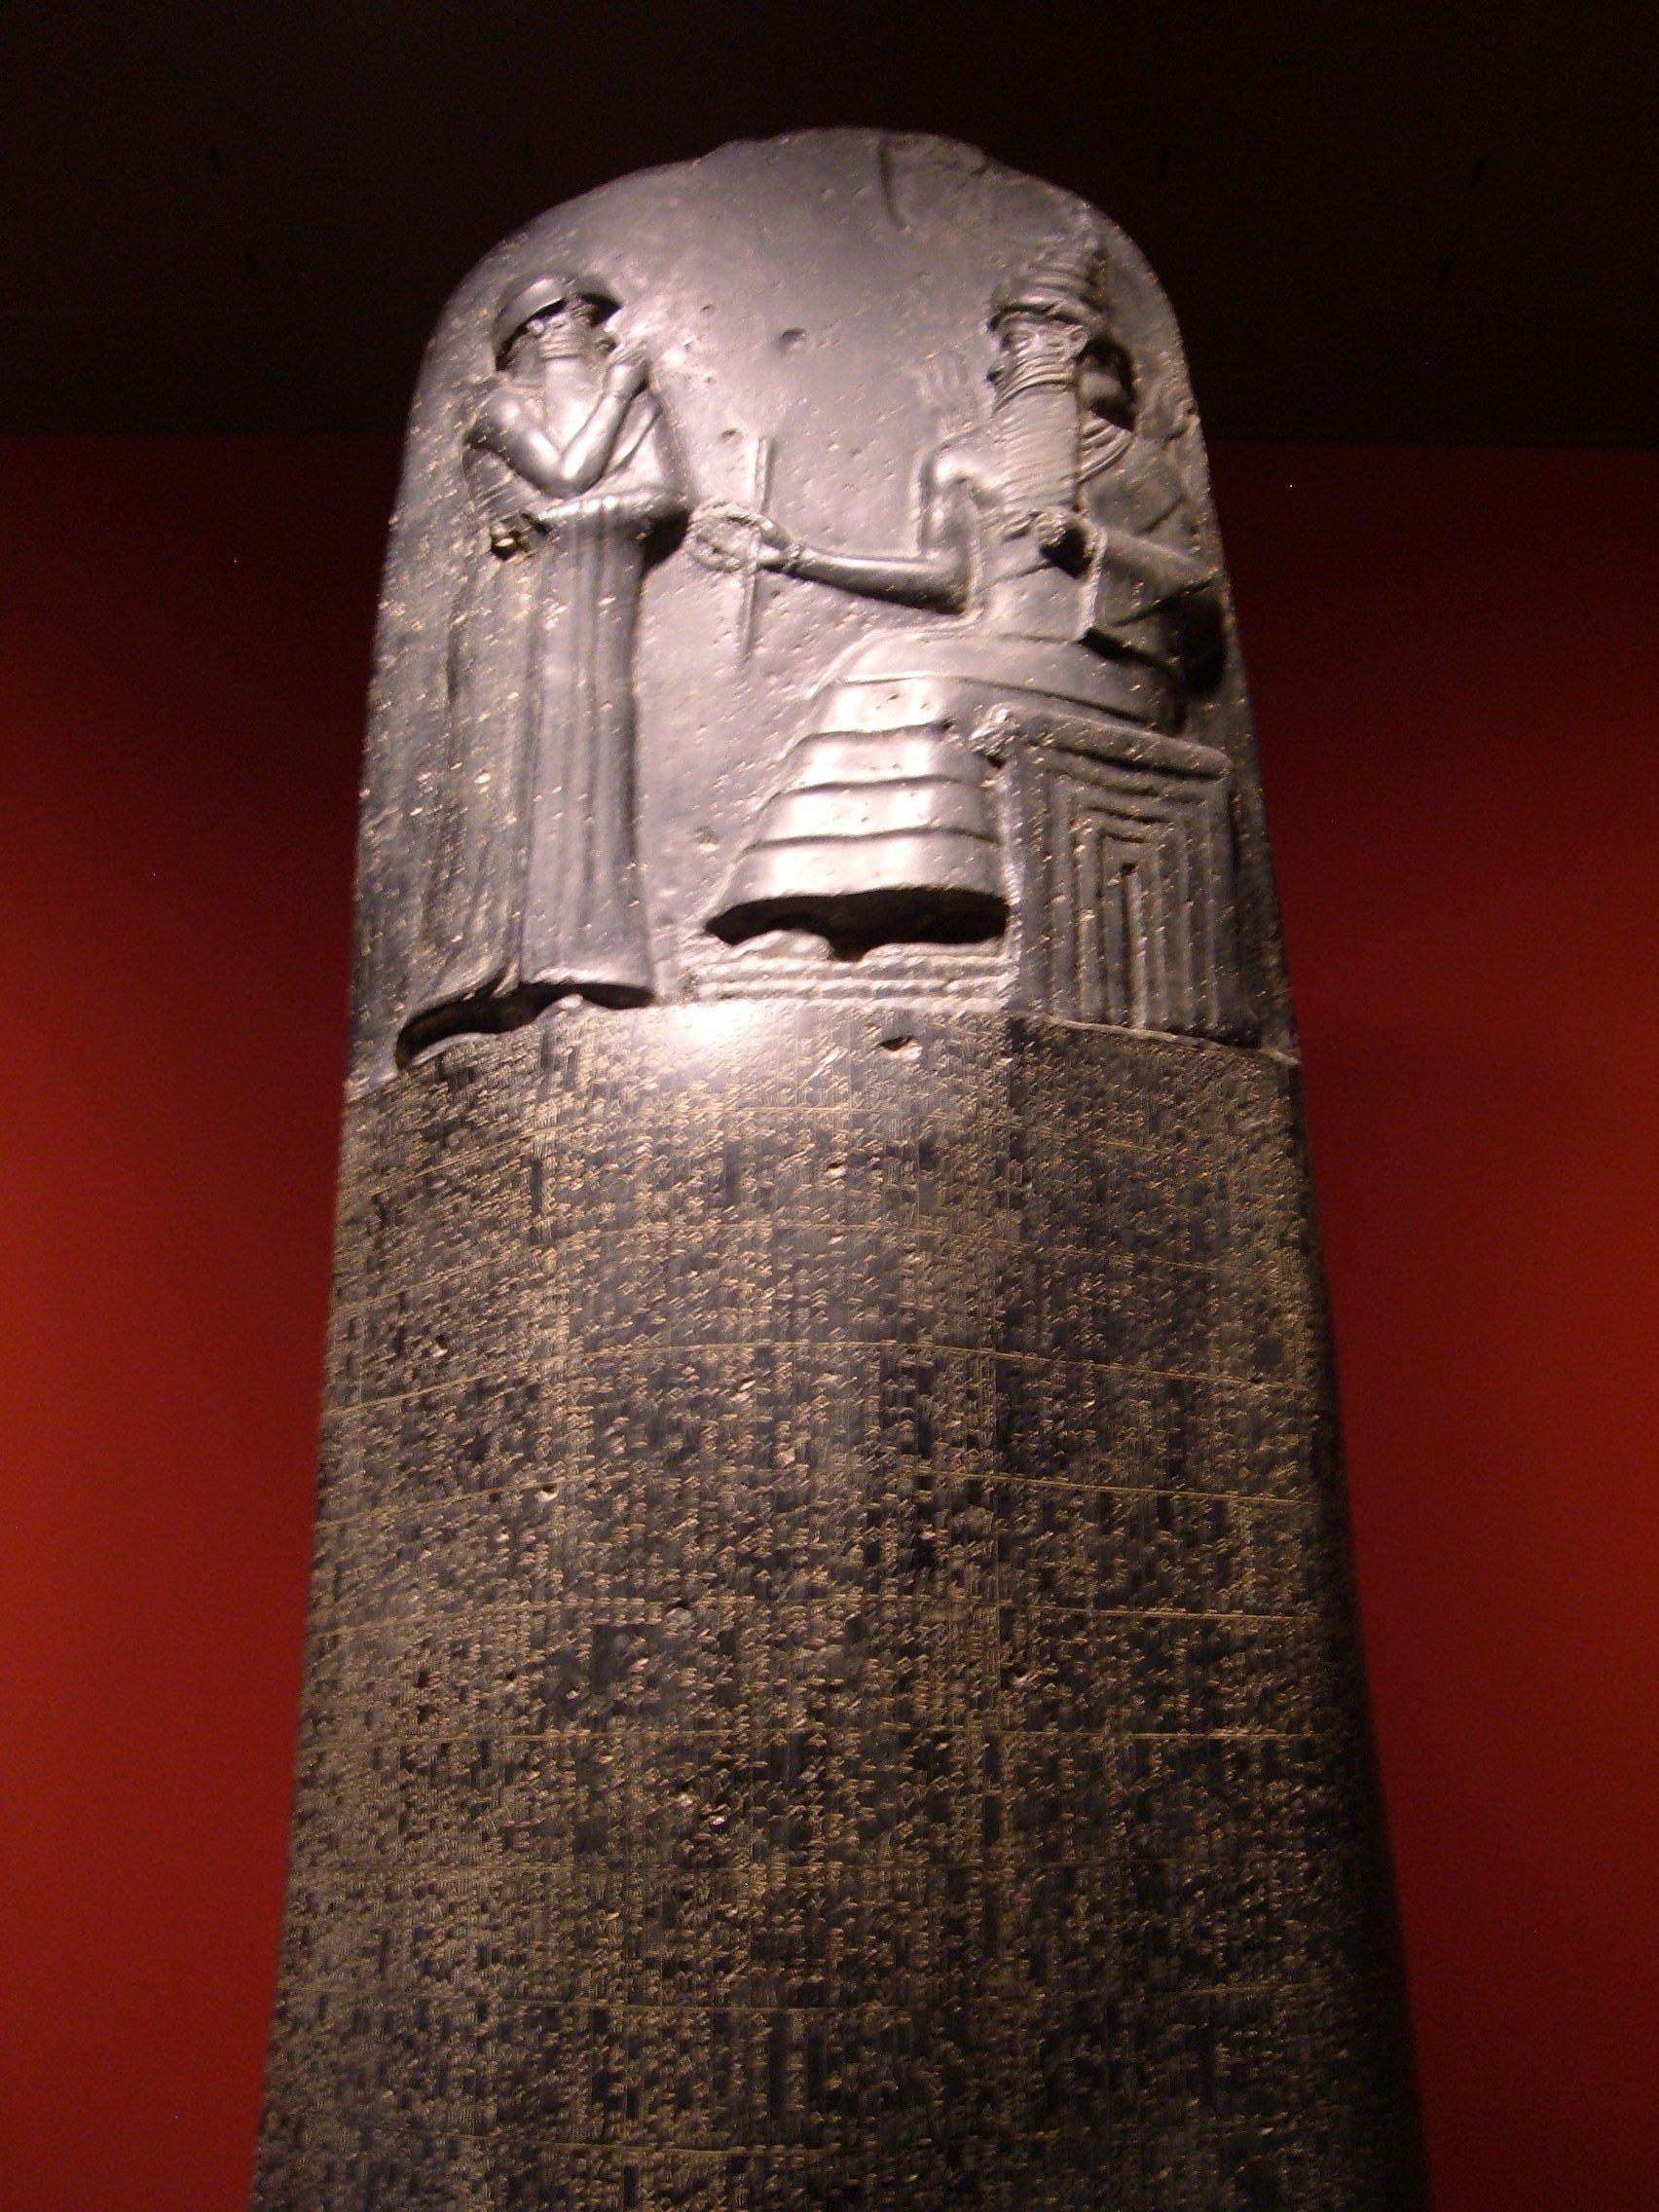 Code of Hammurabi, 1754 BCE